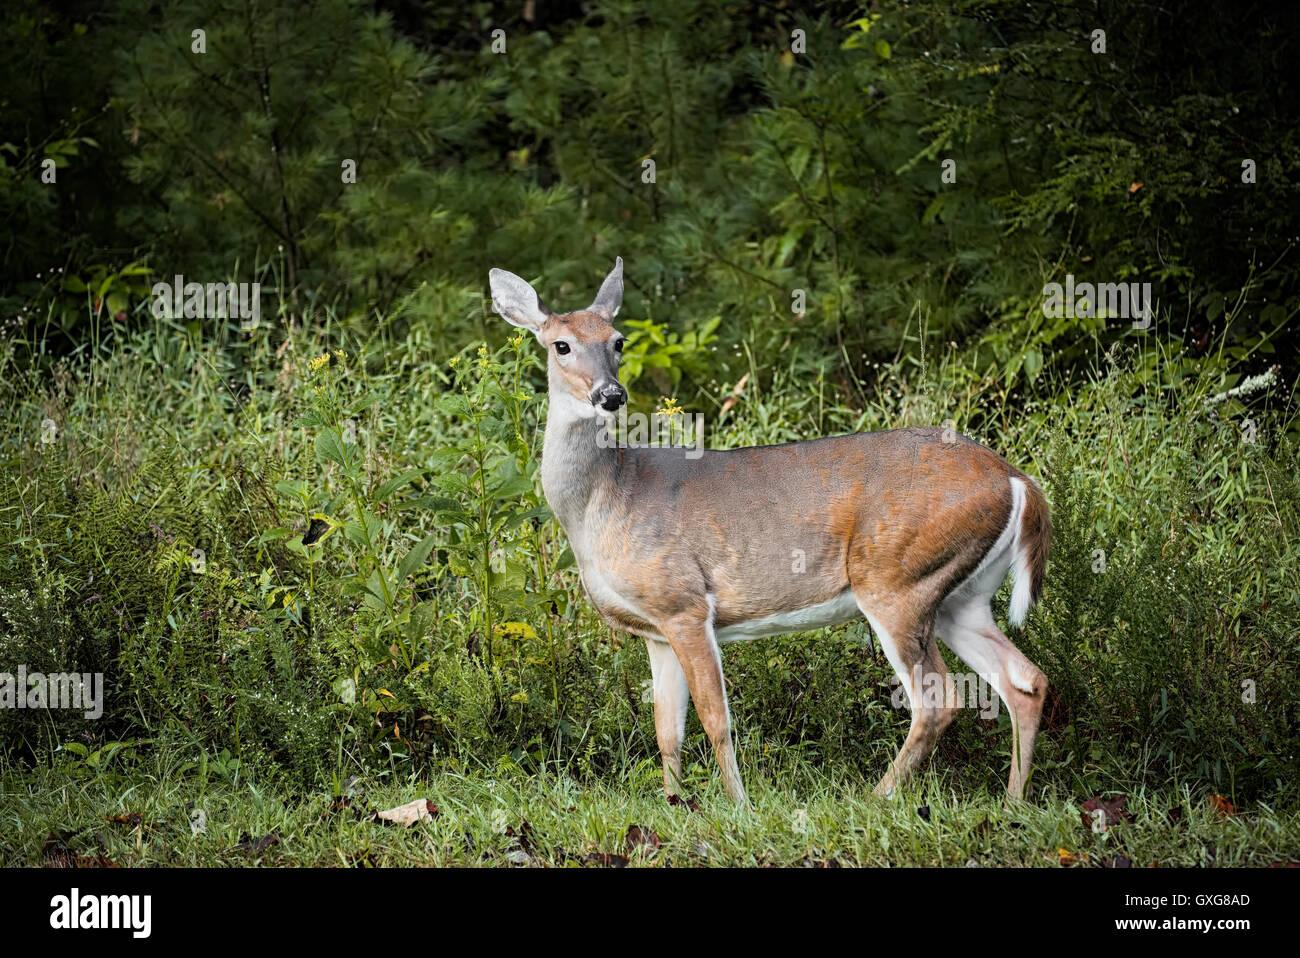 Dans Deer Stone Mountain State Park. Roaring Gap de la faune de la Caroline du Nord Photo Stock